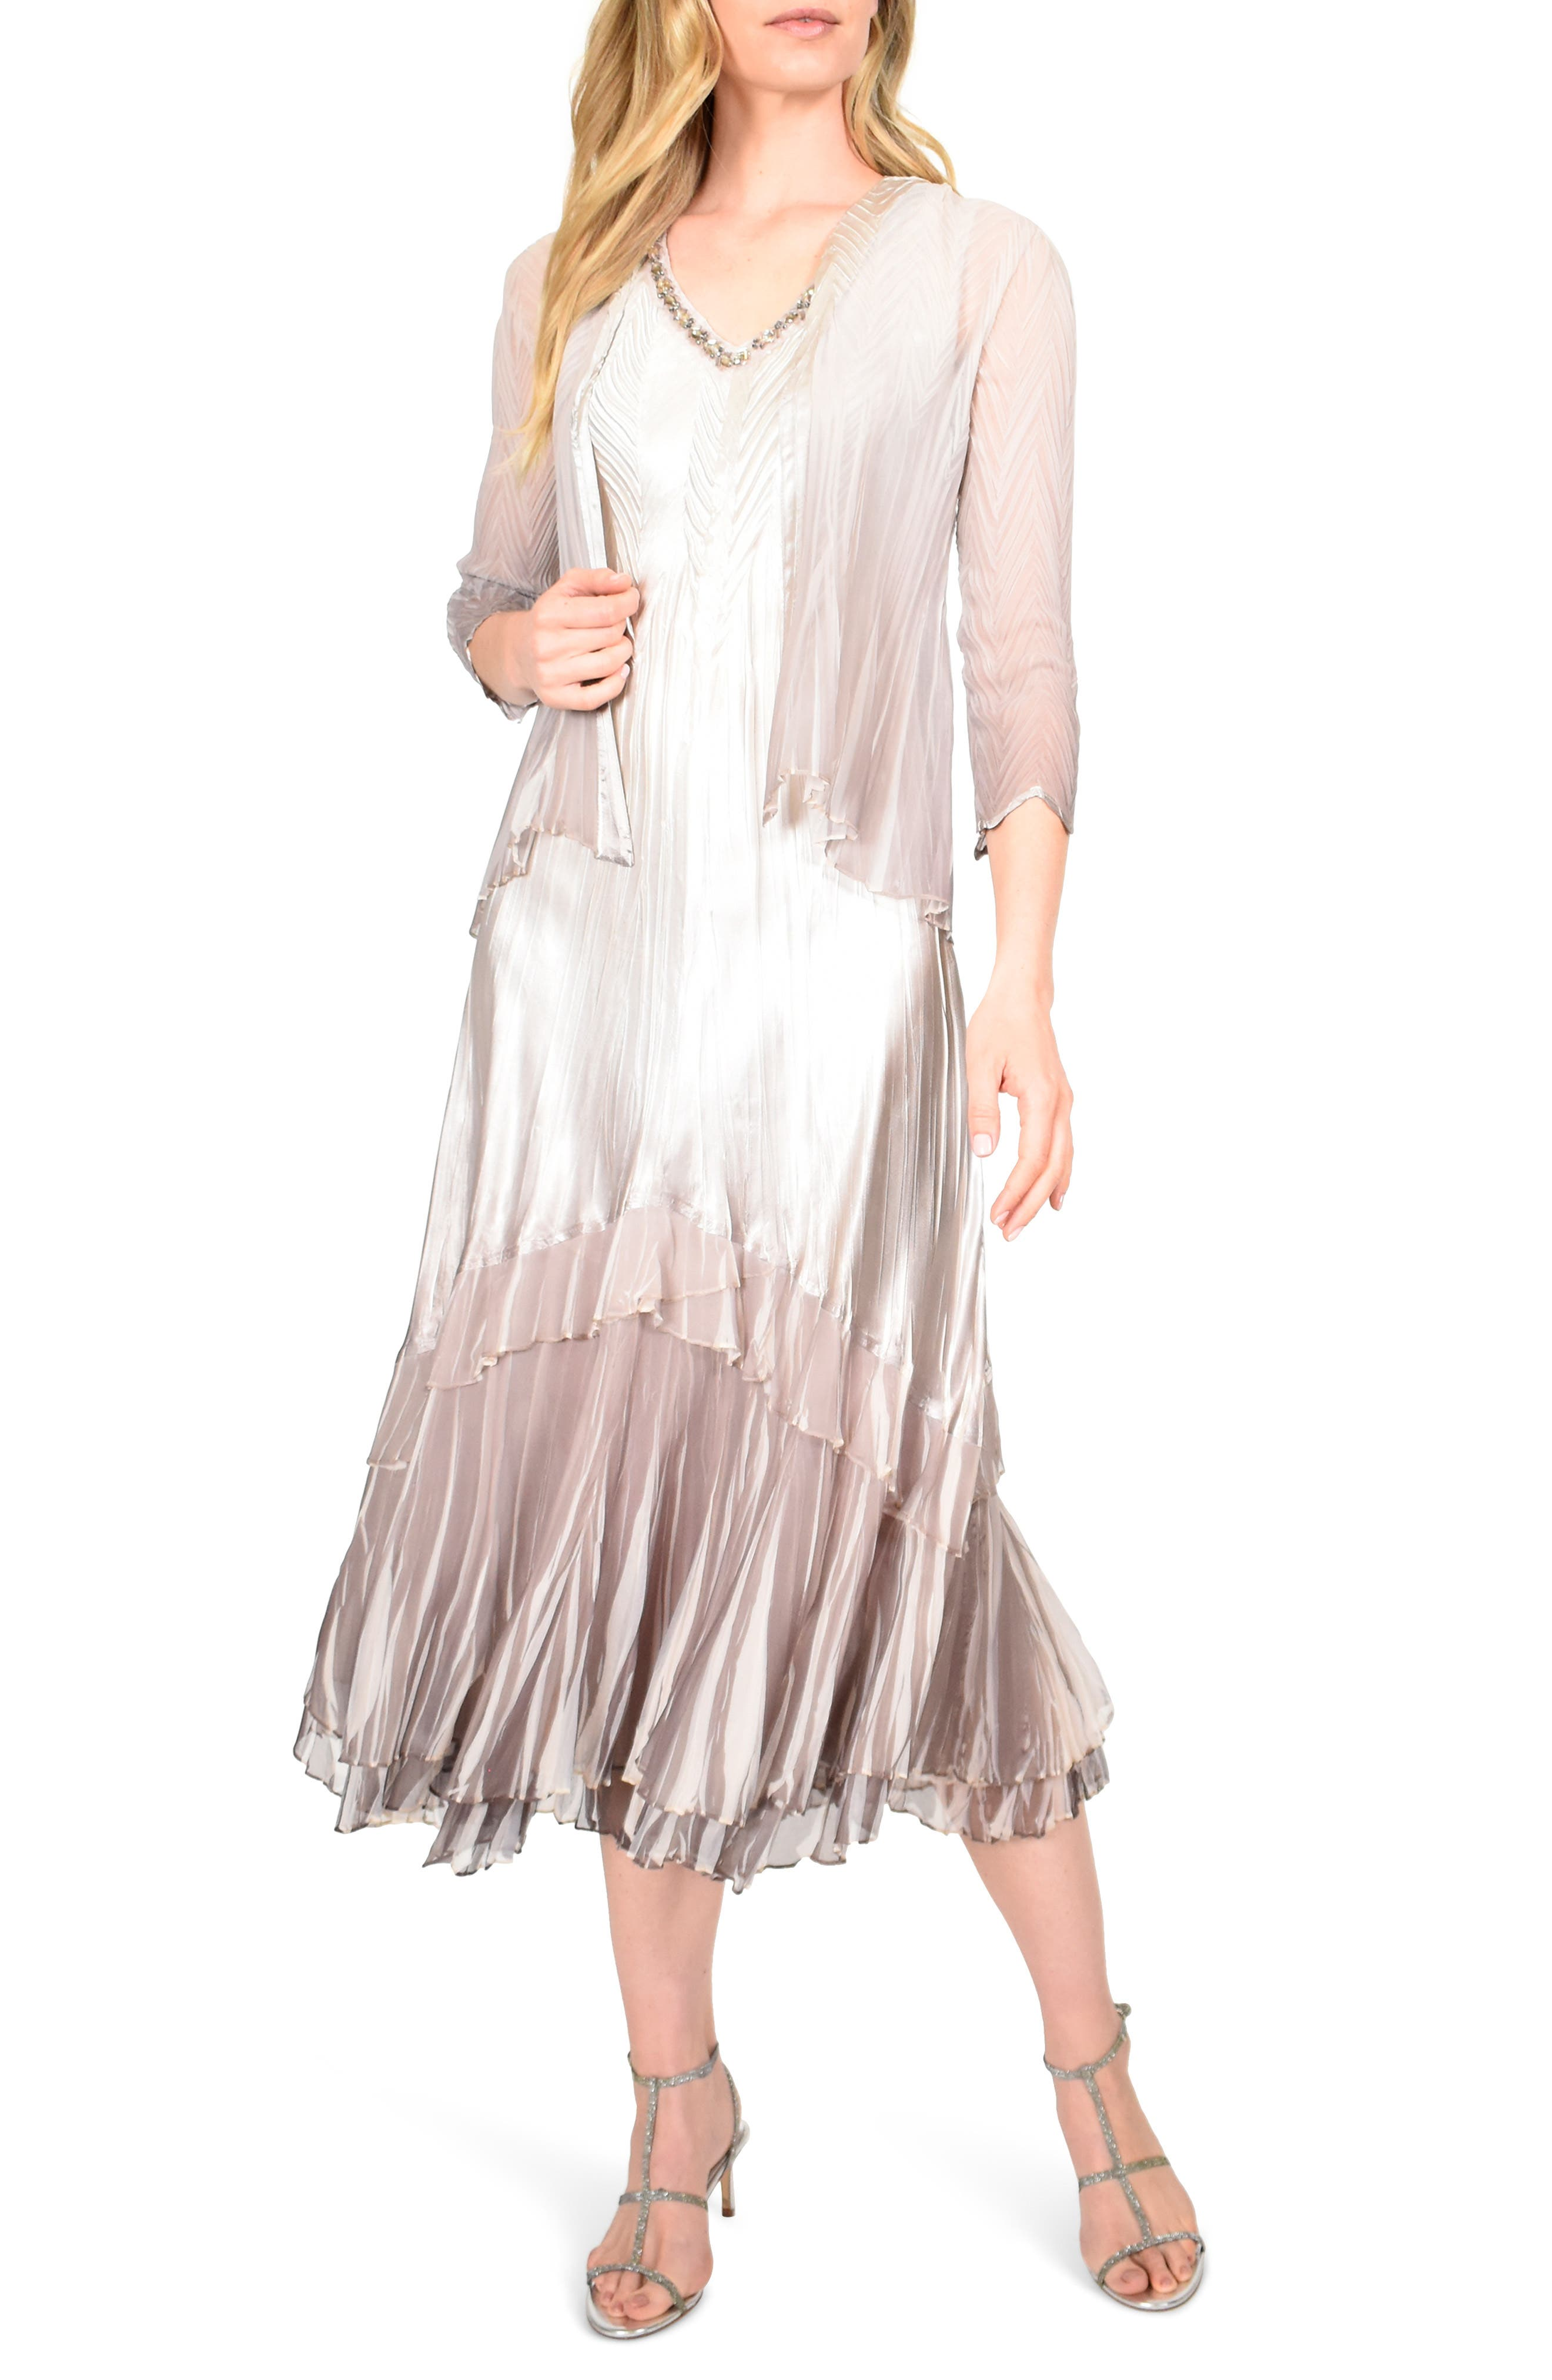 Vintage 1920s Dresses – Where to Buy Womens Komarov Floral Charmeuse  Chiffon Jacket Dress Size X-Large - Beige $458.00 AT vintagedancer.com